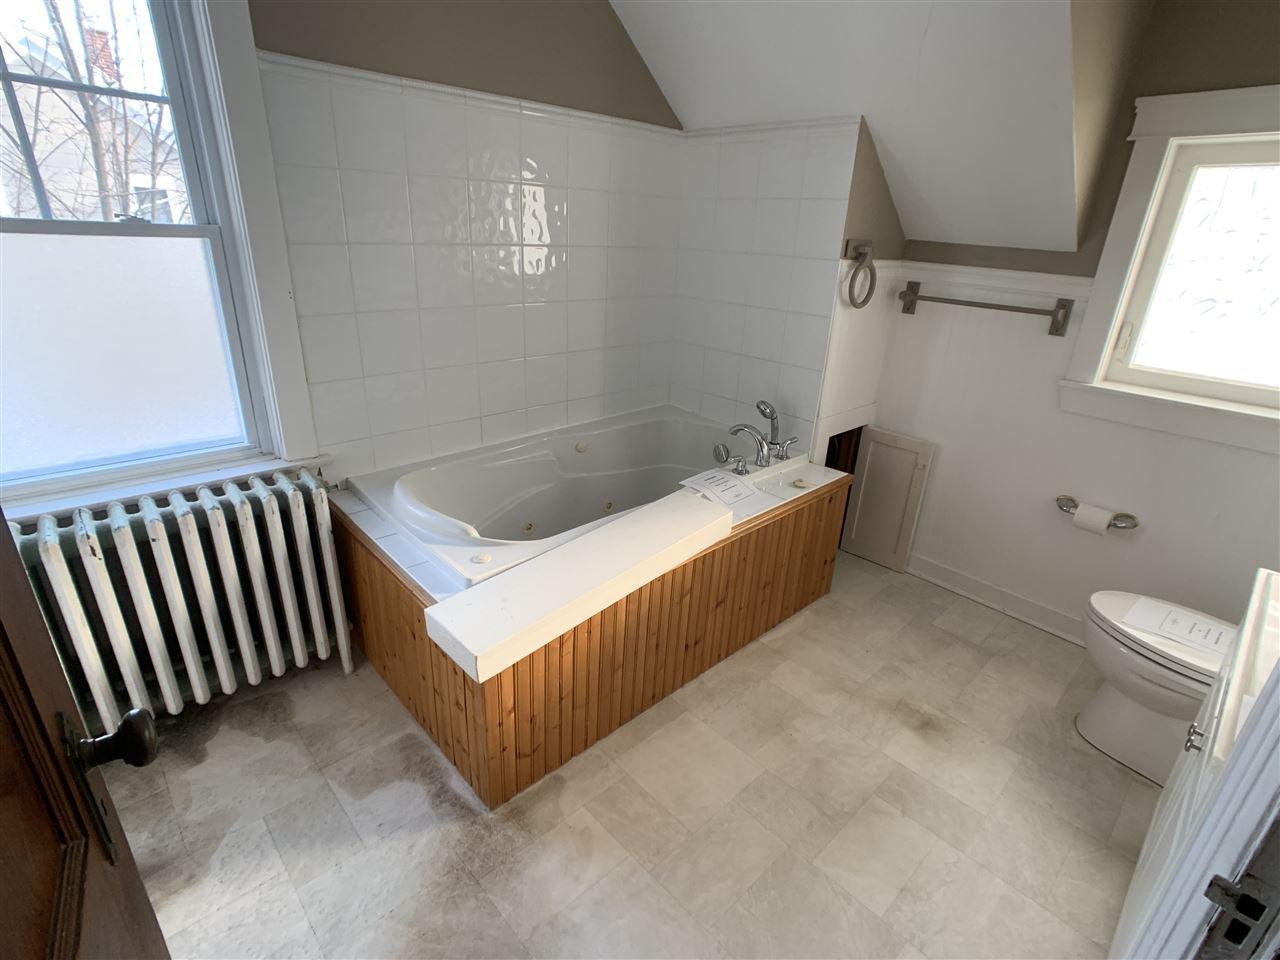 Photo 19: Photos: 30 Bell Street in New Glasgow: 106-New Glasgow, Stellarton Residential for sale (Northern Region)  : MLS®# 202002376